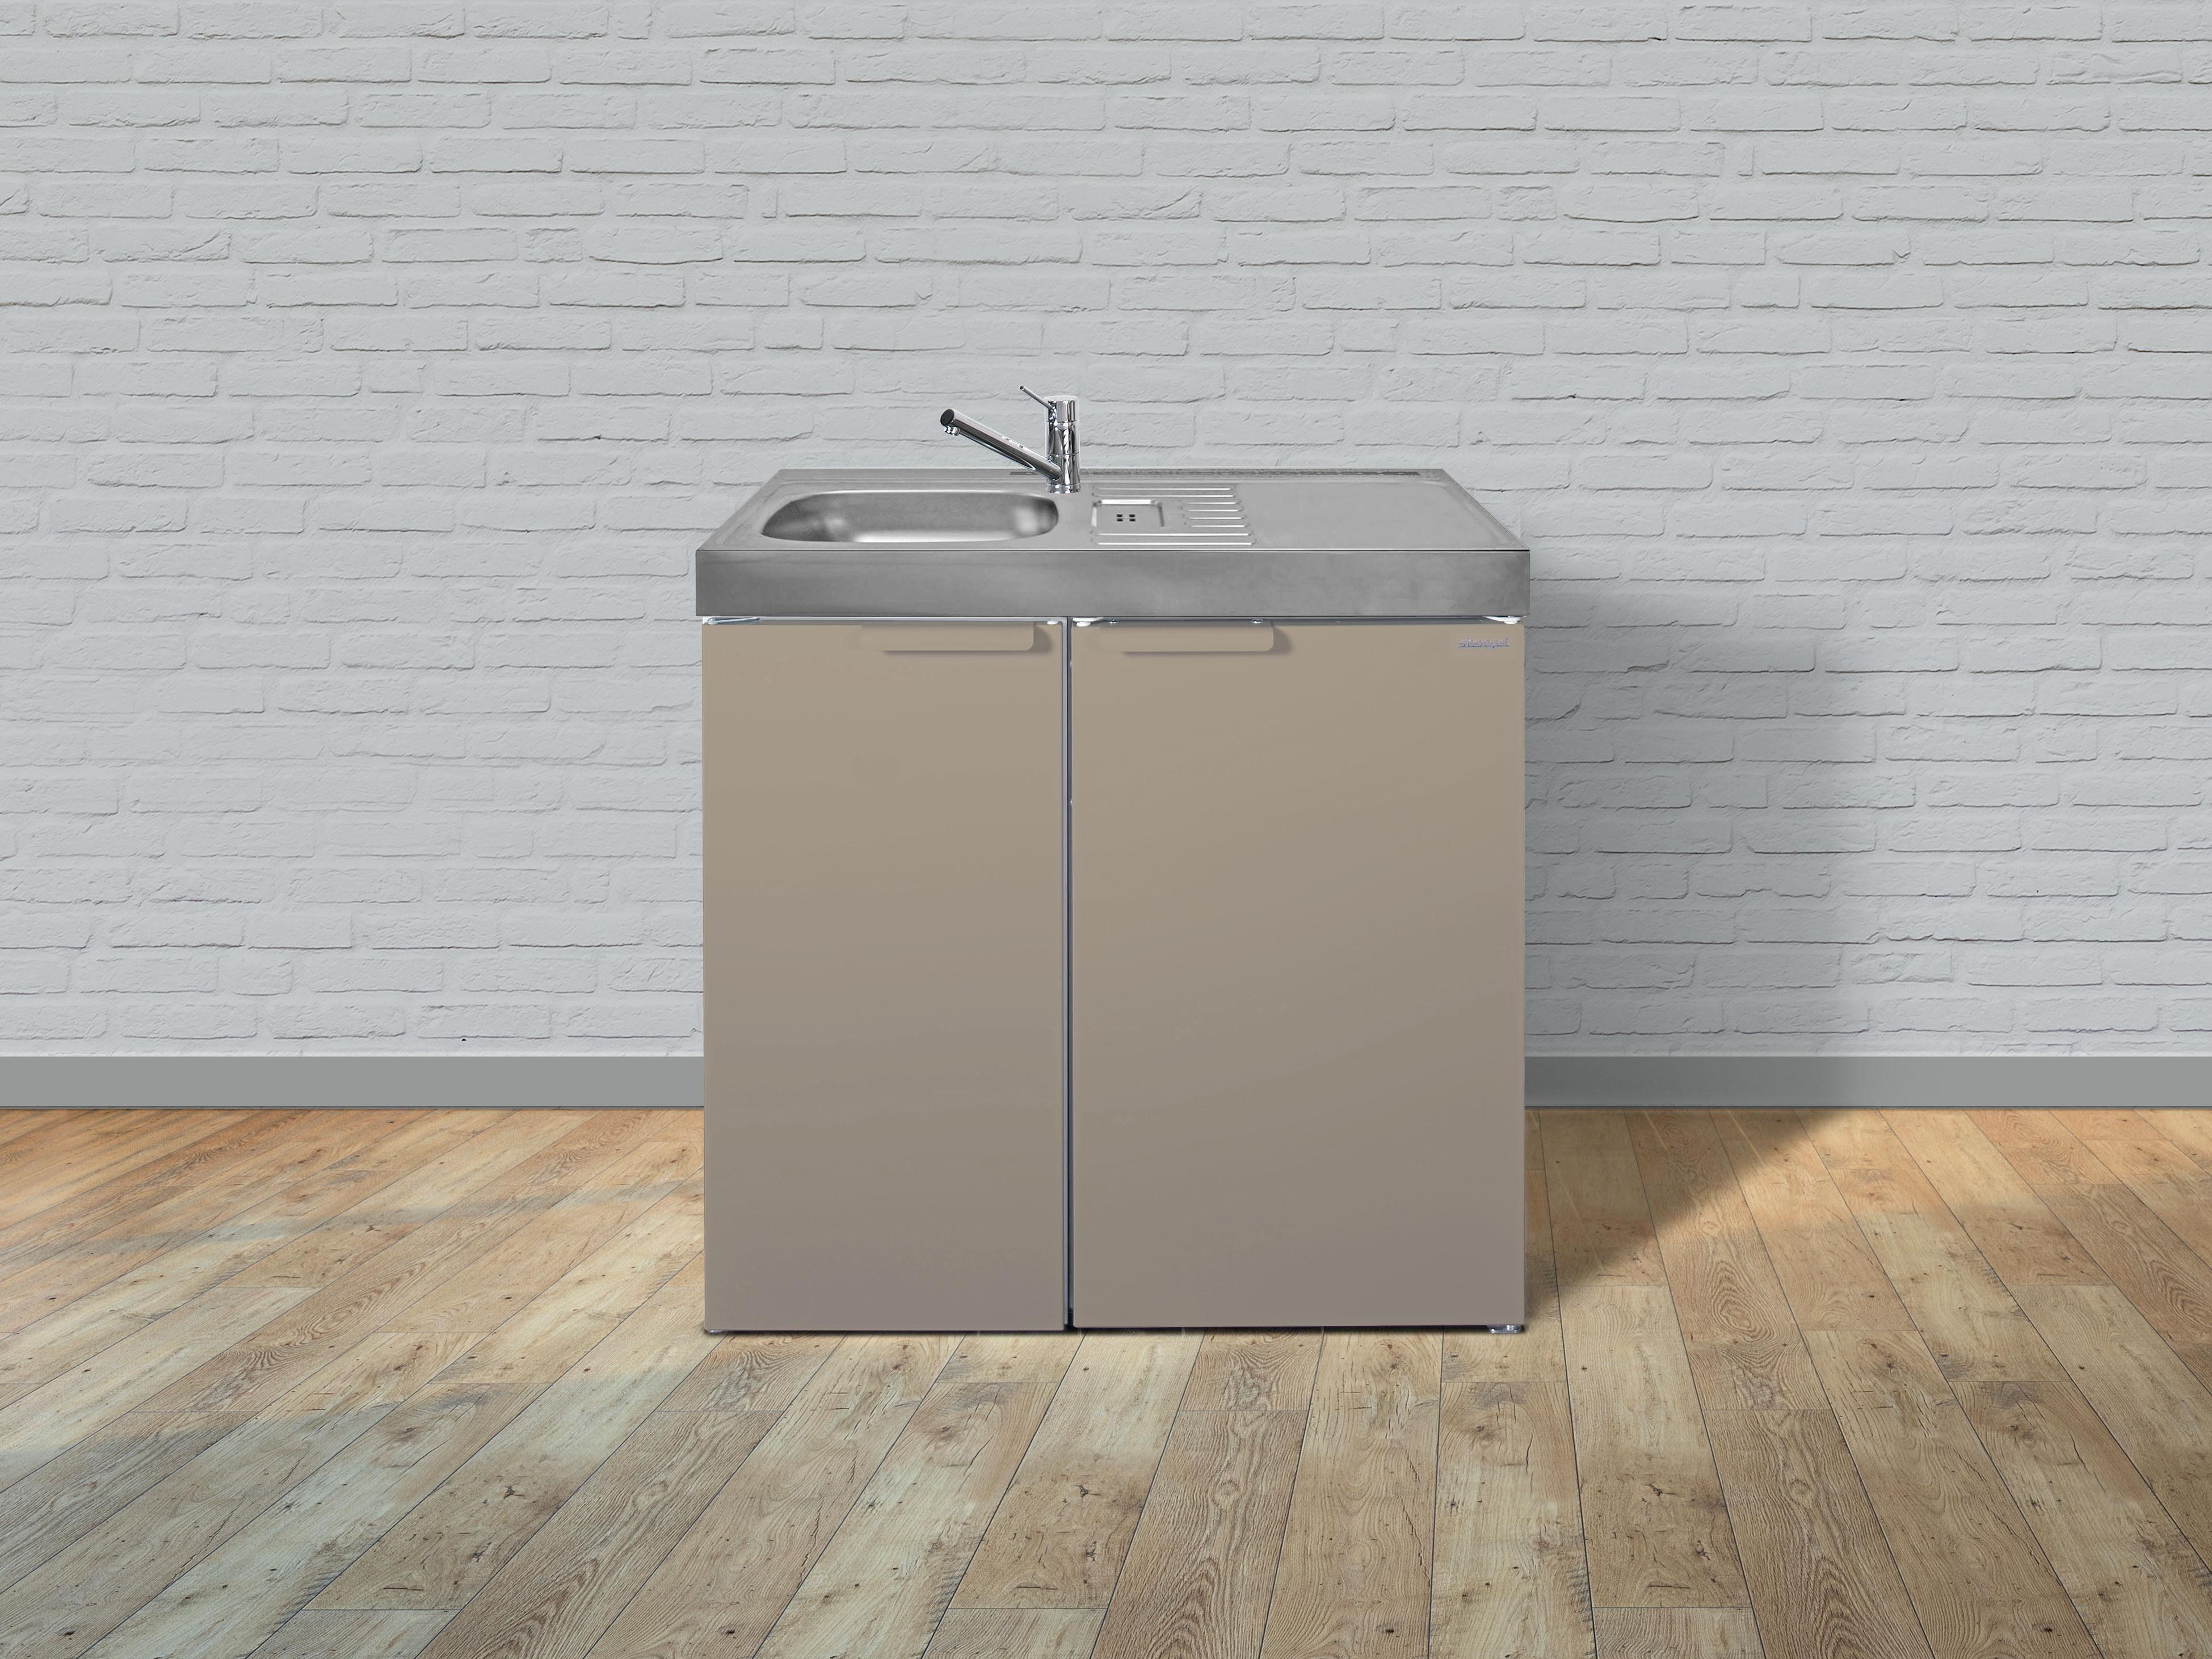 Miniküche Kühlschrank Links : Stengel metall miniküche kitchenline mk mit kühlschrank ohne